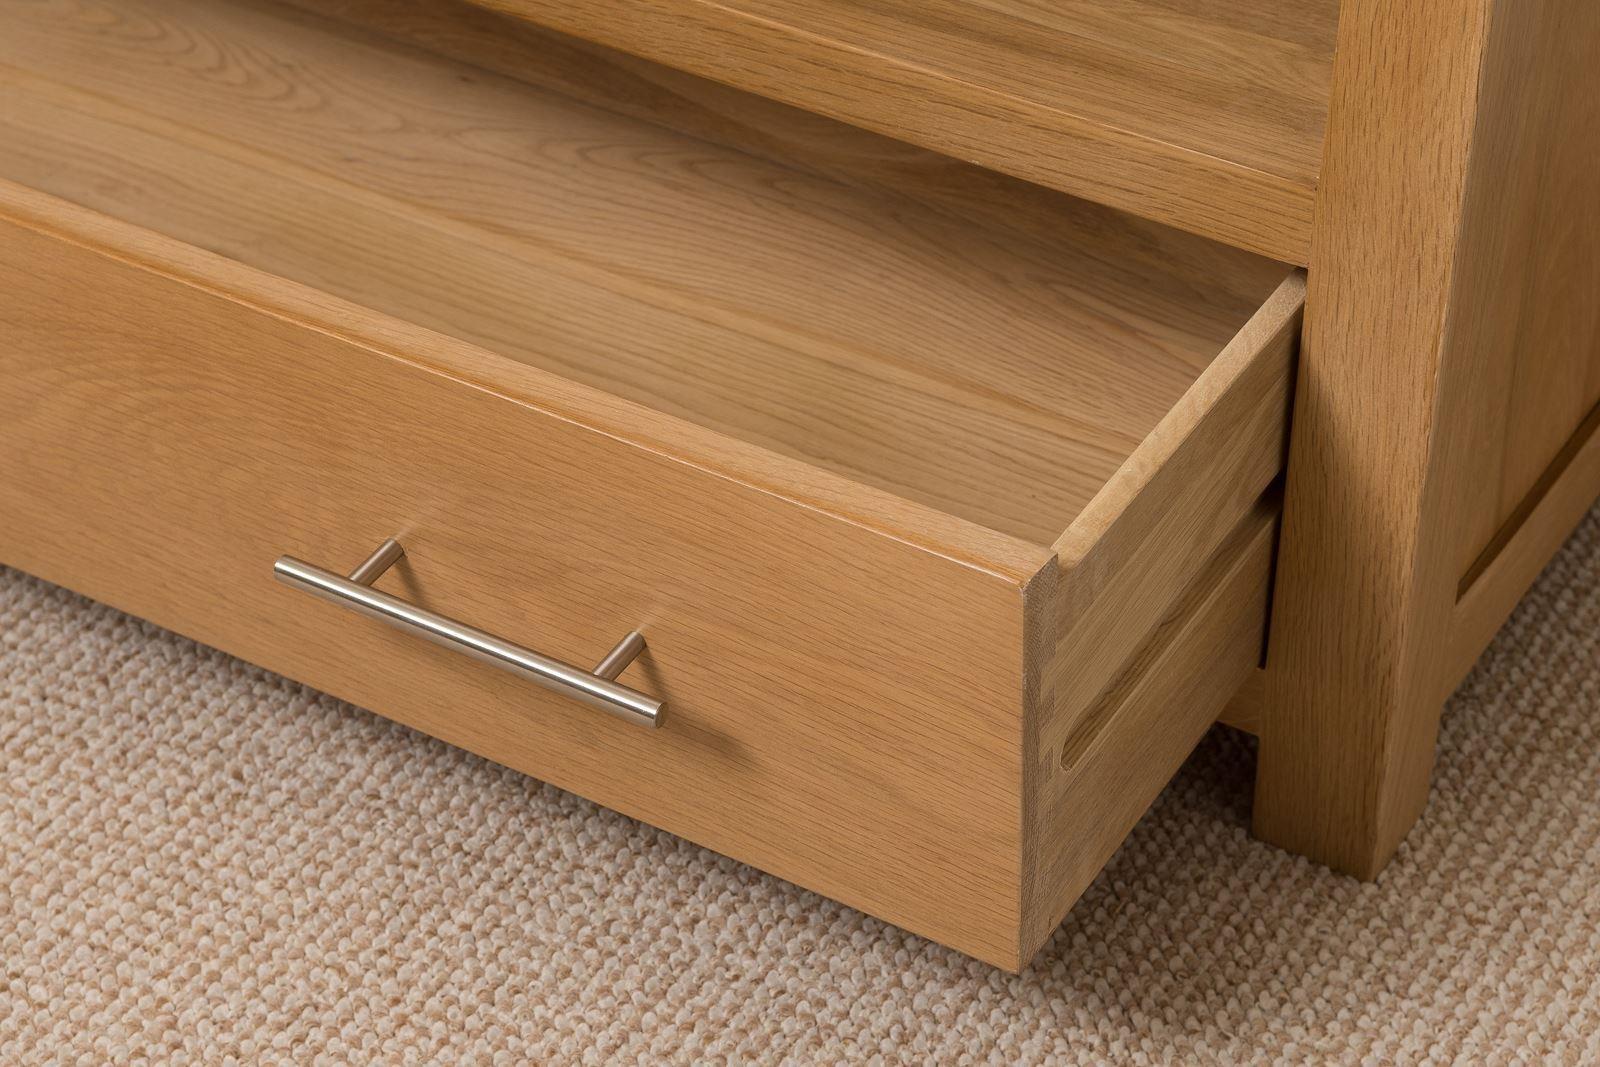 Oslo solid oak tv cabinet small modern furniture direct for Modern furniture direct